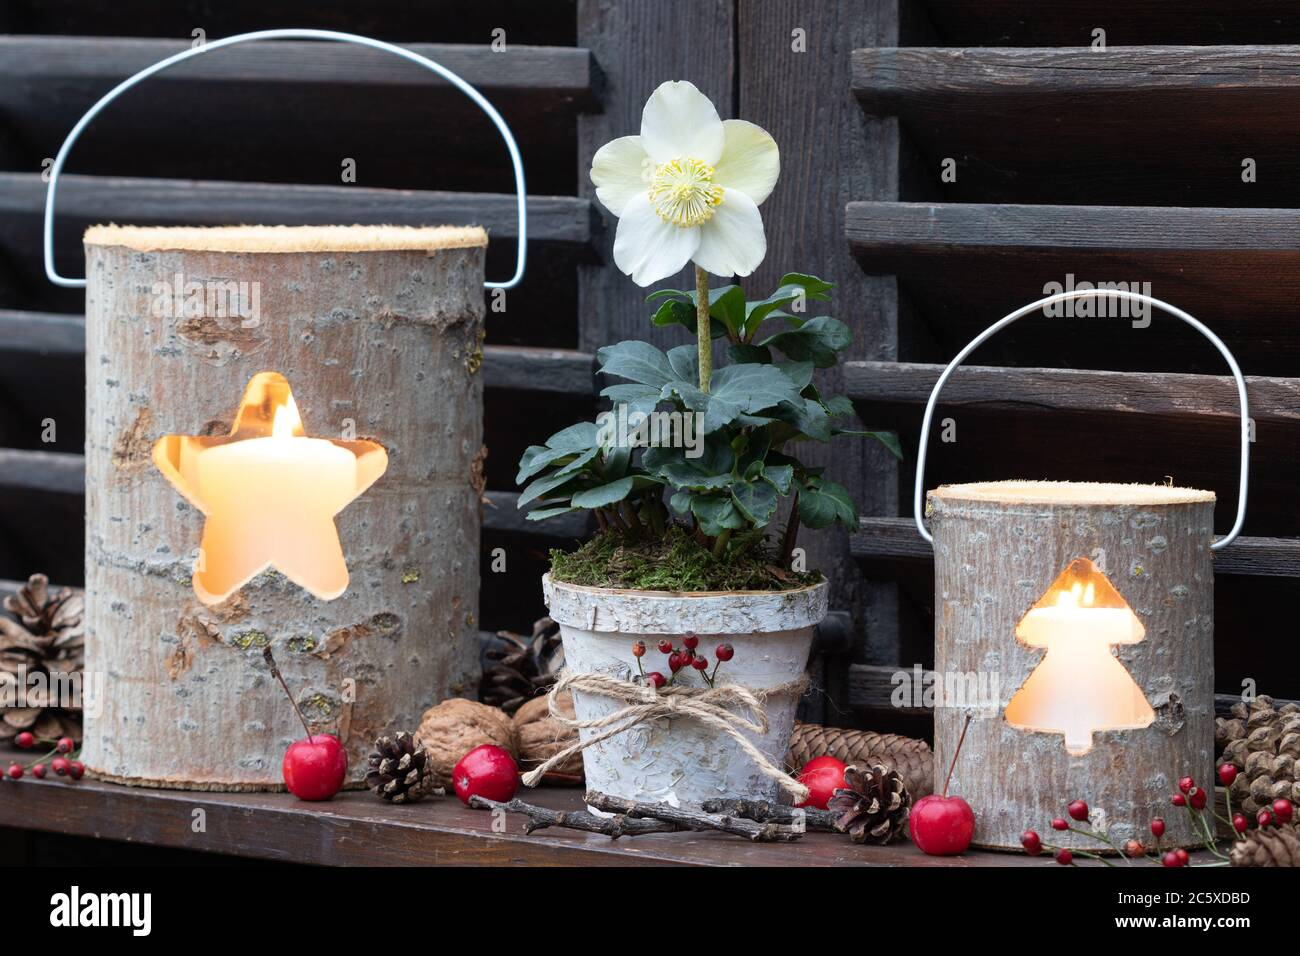 Christmas Garden Decoration With Helleborus Niger And Wooden Lanterns Stock Photo Alamy